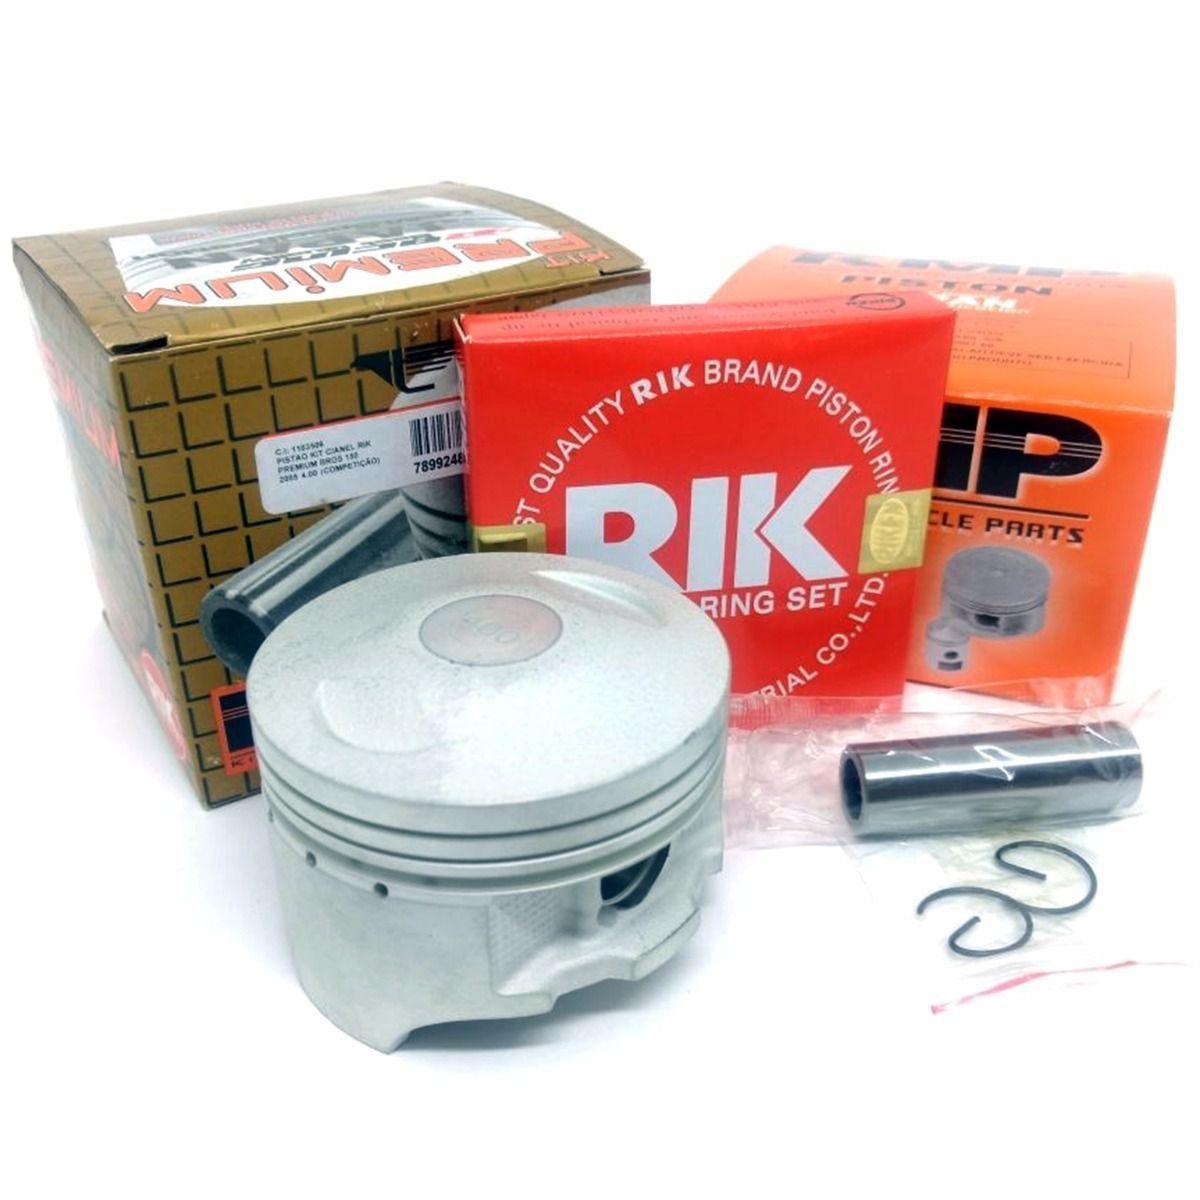 Kit Pistão Kmp Premium Anéis Rik Nxr Bros 150 Ohc 2003 á 2005 Std Á 4.00mm